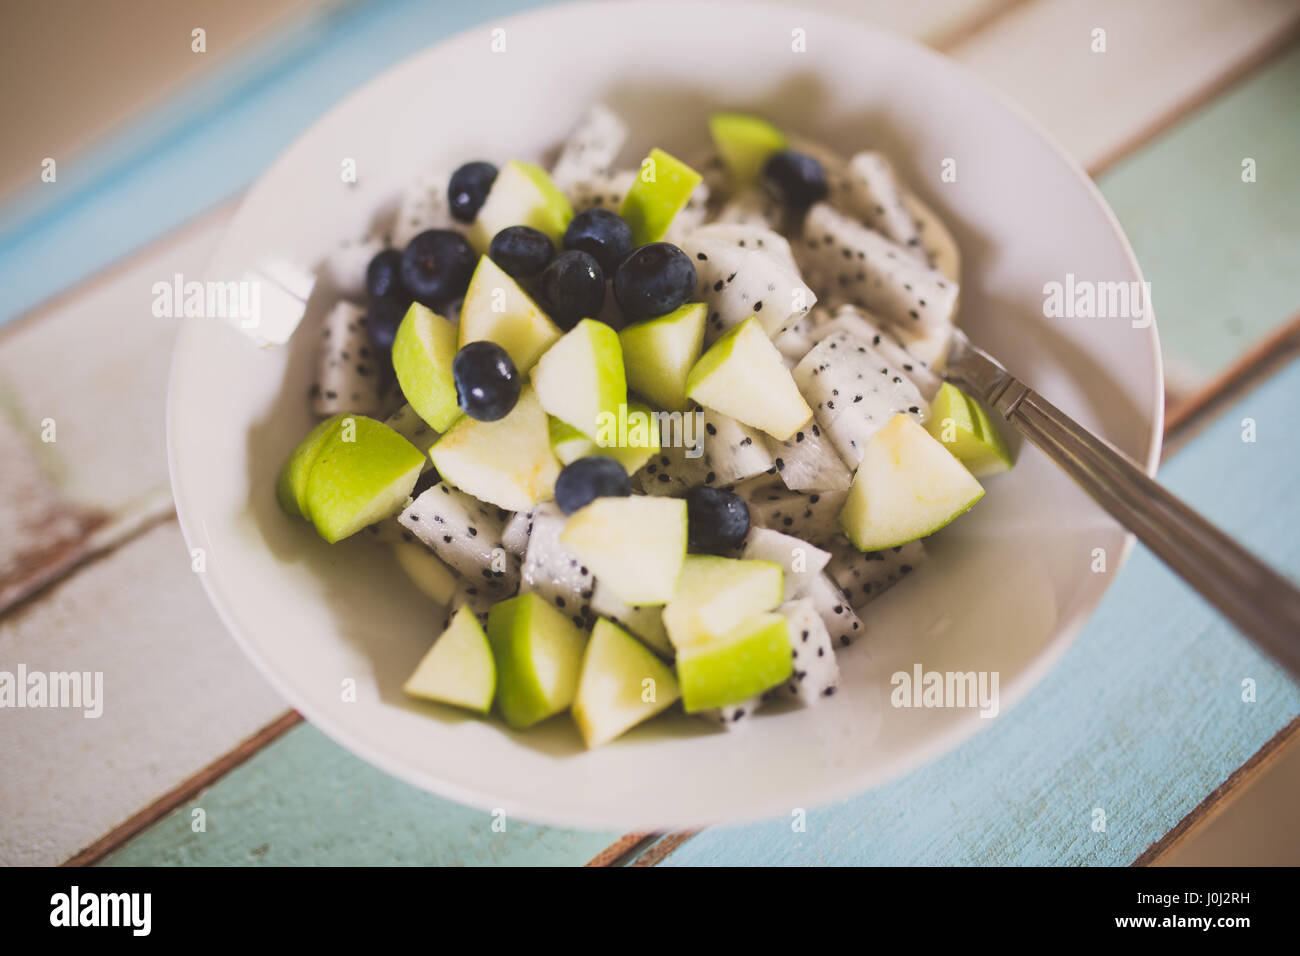 Apple and dragonfruit Breakfast Bowl - Stock Image